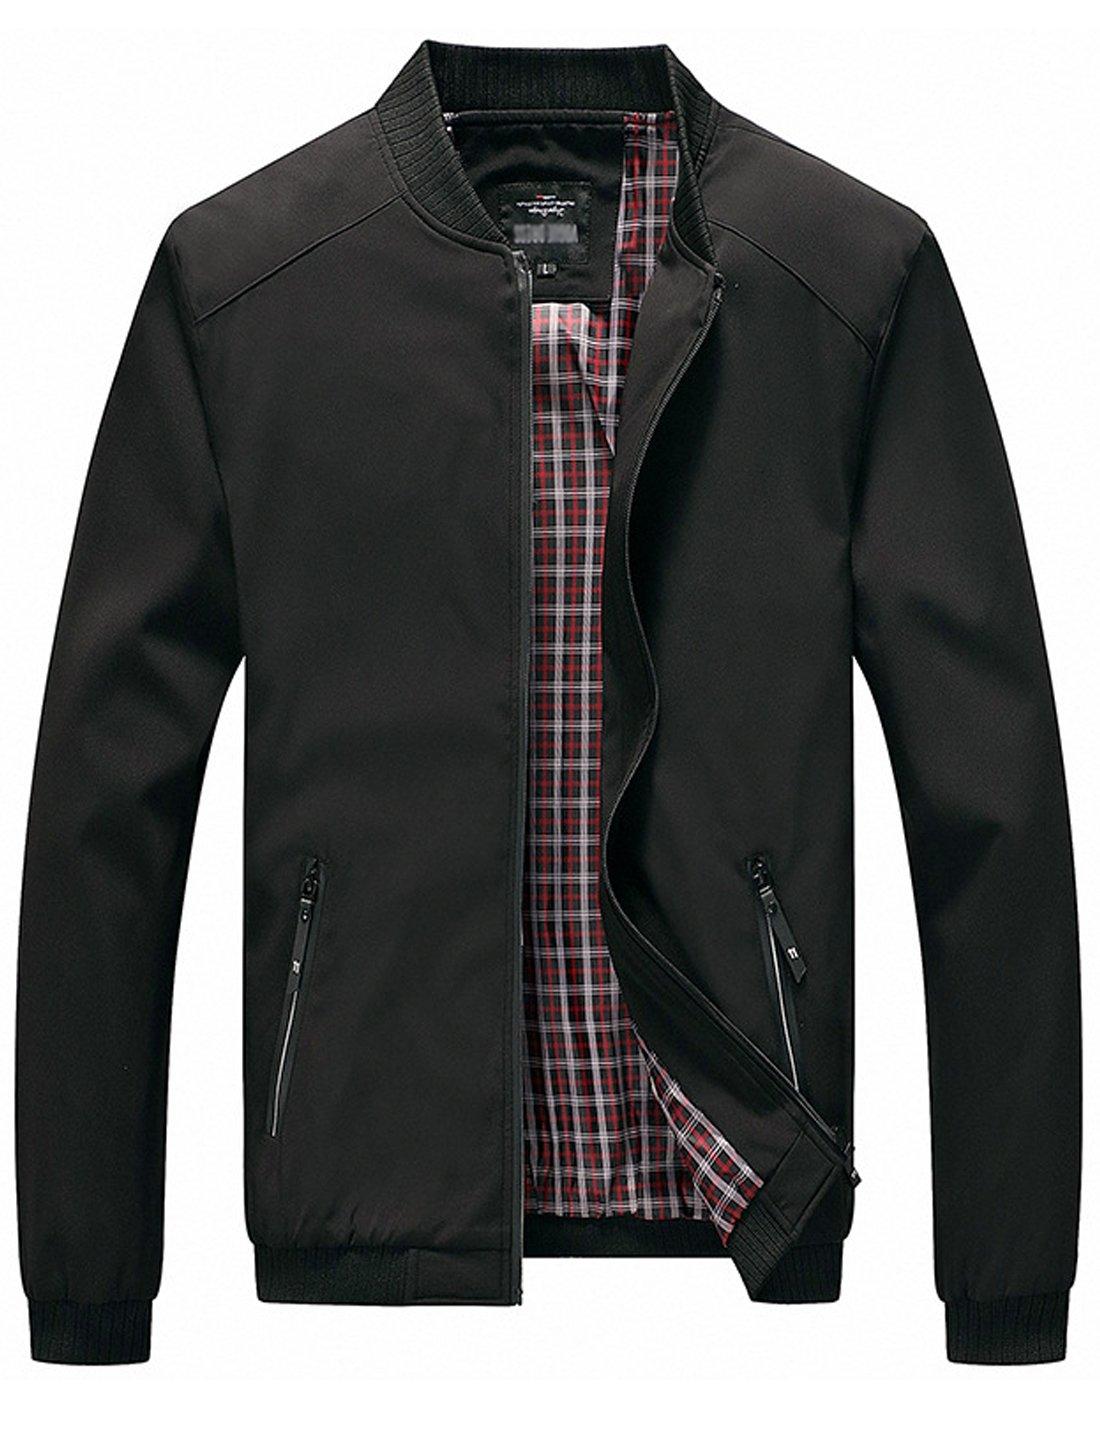 Tanming Men's Color Block Slim Casual Thin Lightweight Bomber Jacket (X-Large, Black-169) by Tanming